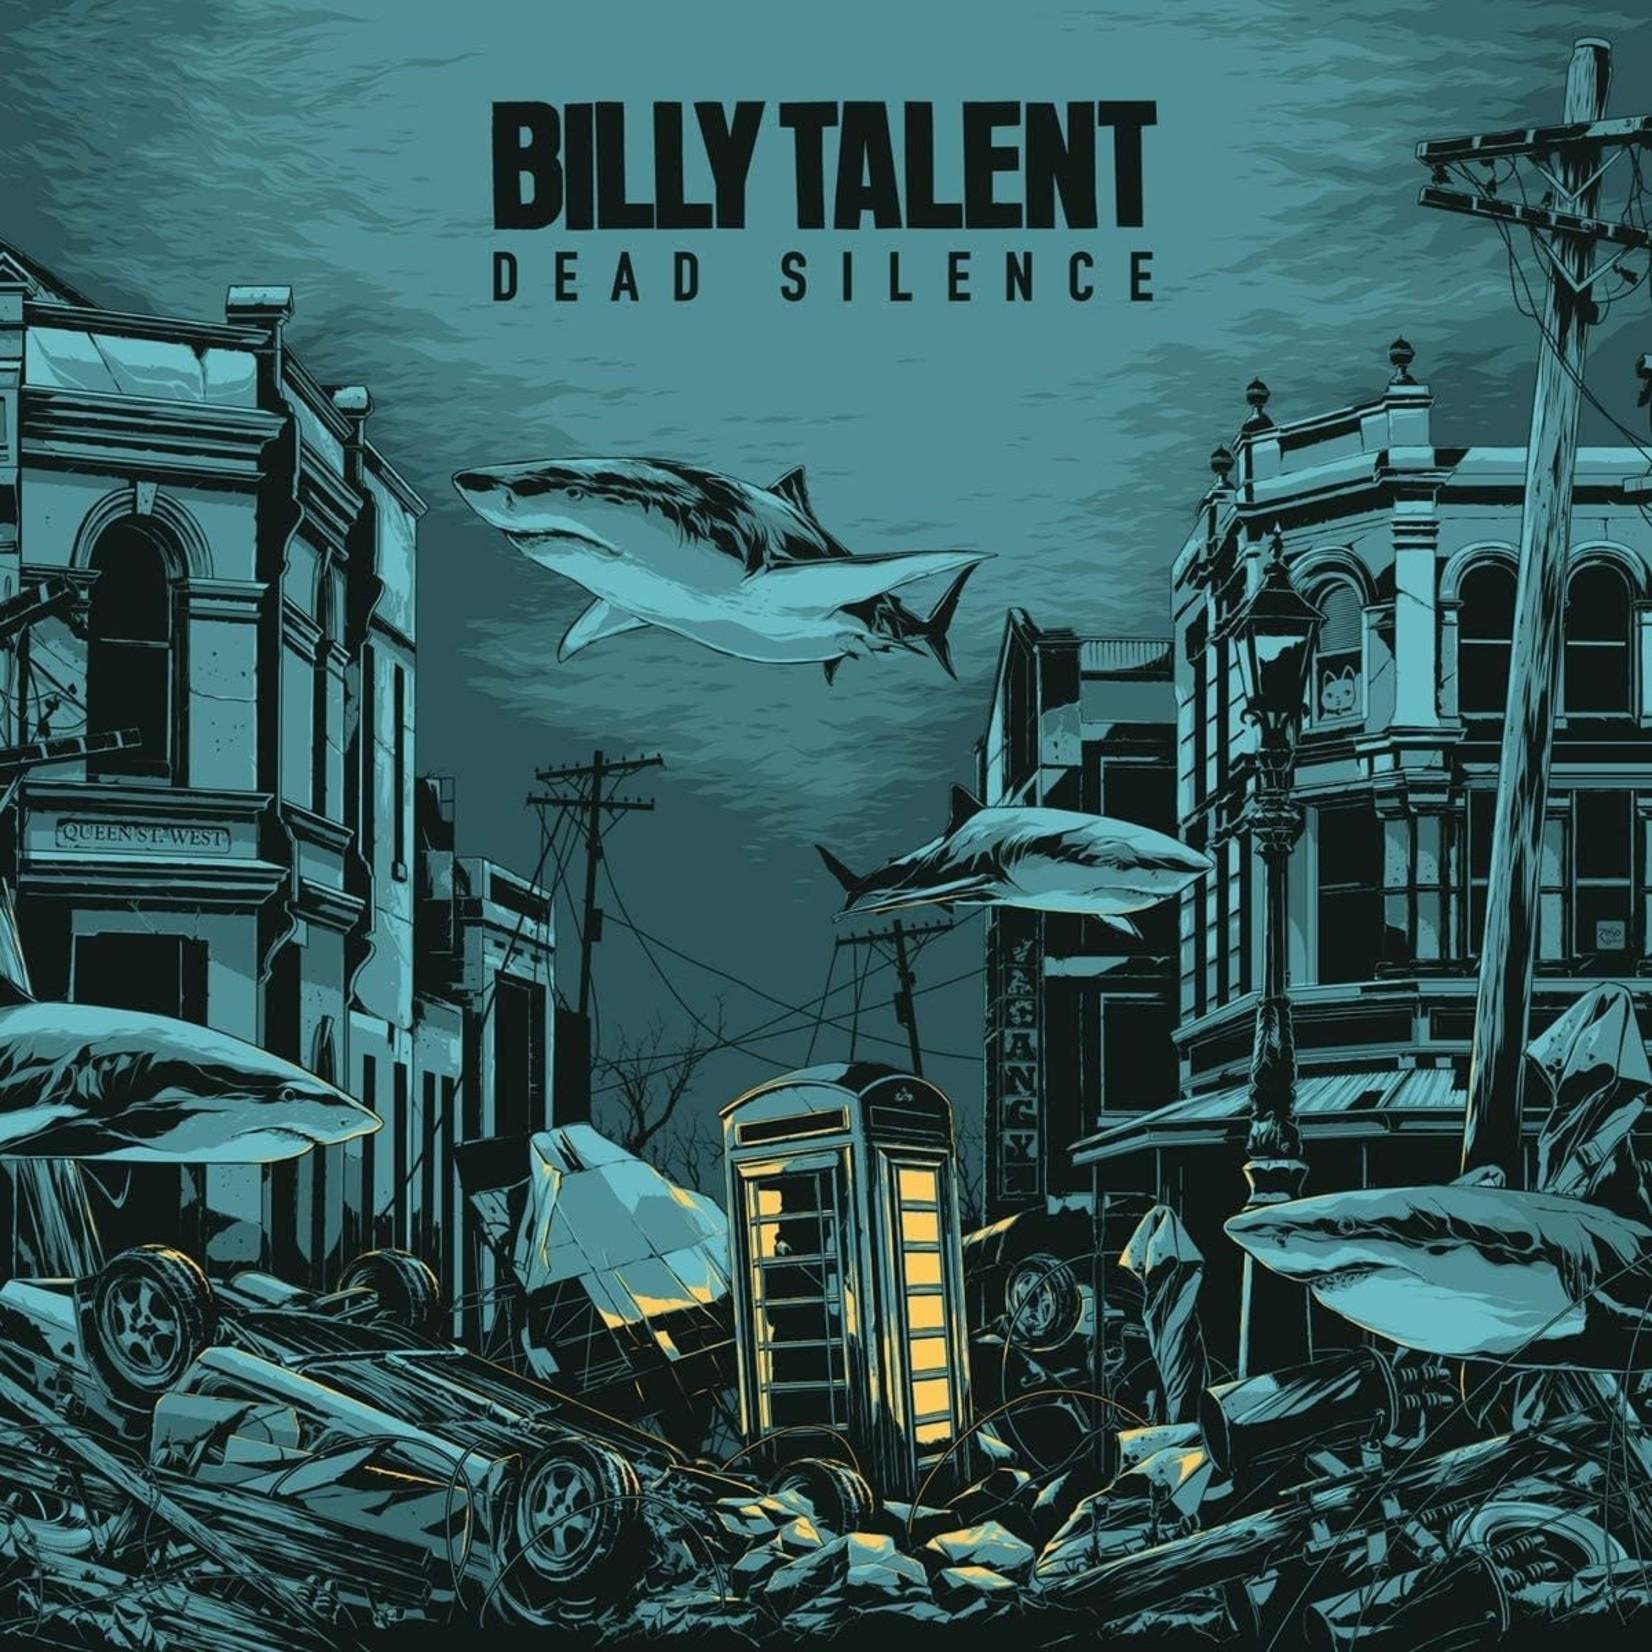 [New] Billy Talent: Dead Silence (2LP, 180g, colour vinyl)